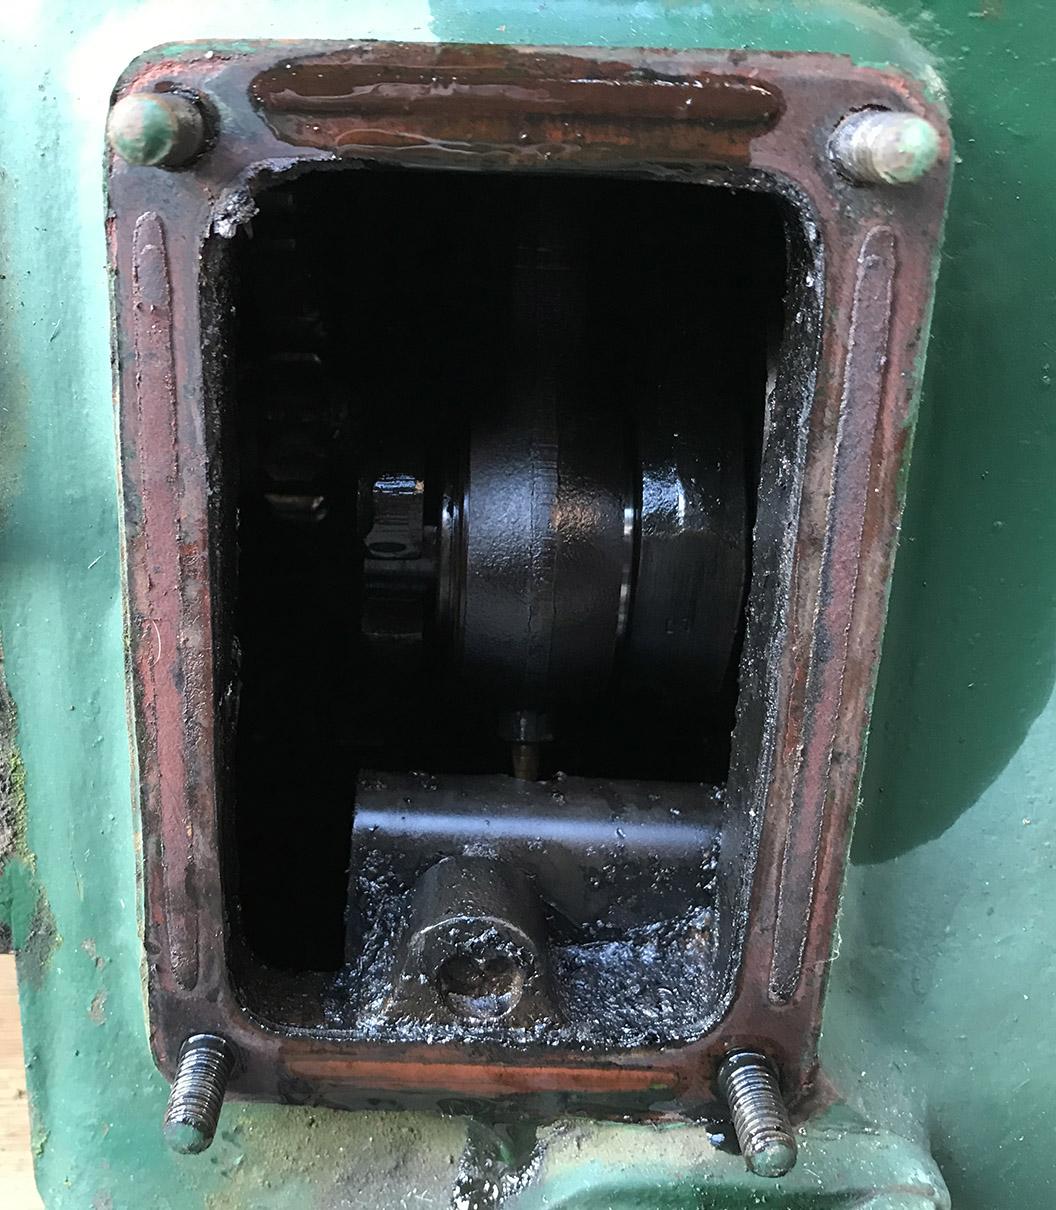 Lister D engine crank case door removed